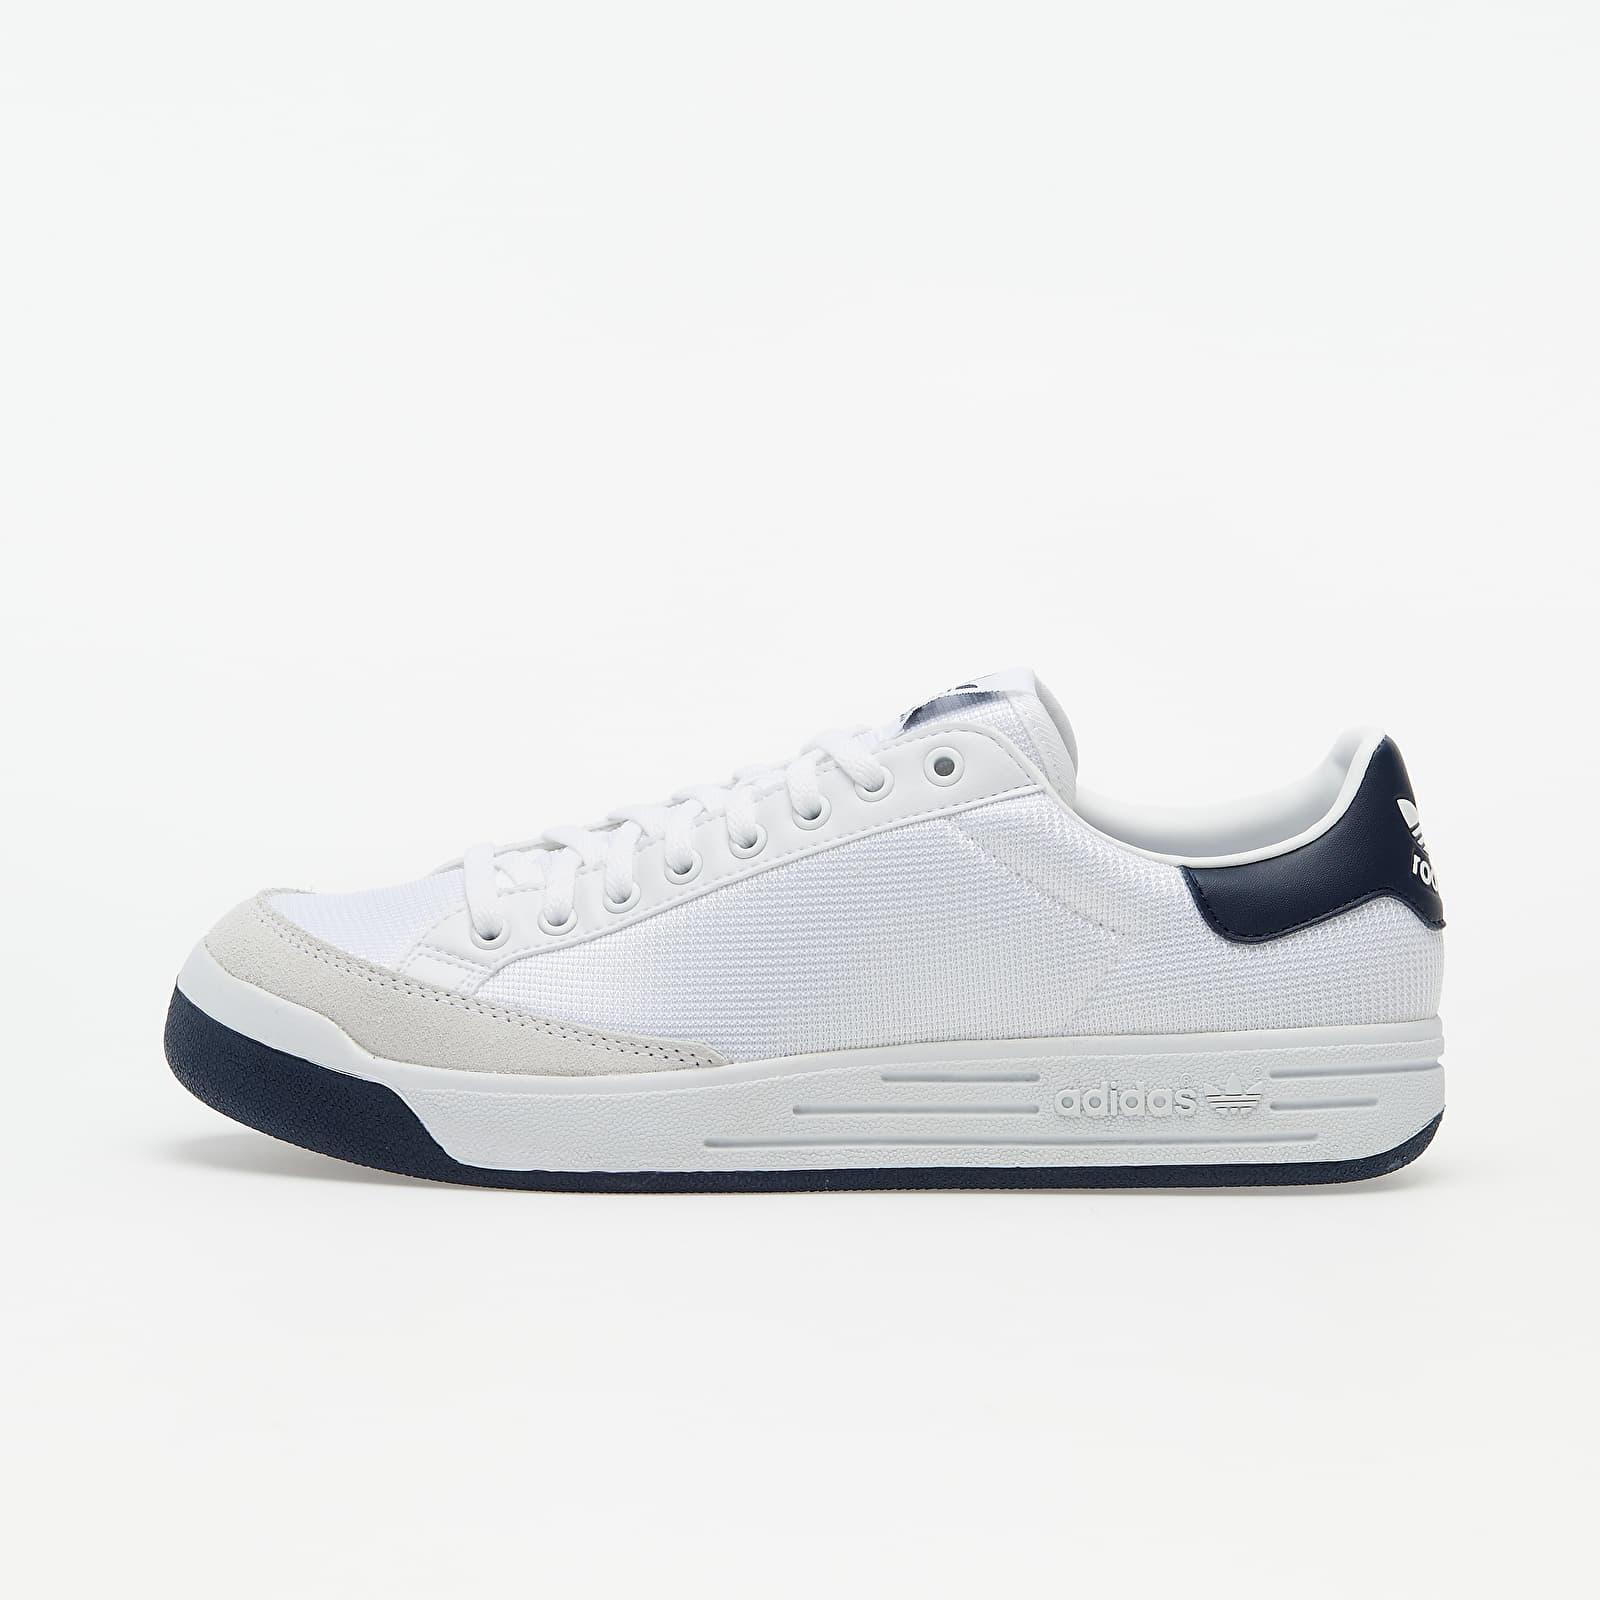 Men's shoes adidas Rod Laver Run White